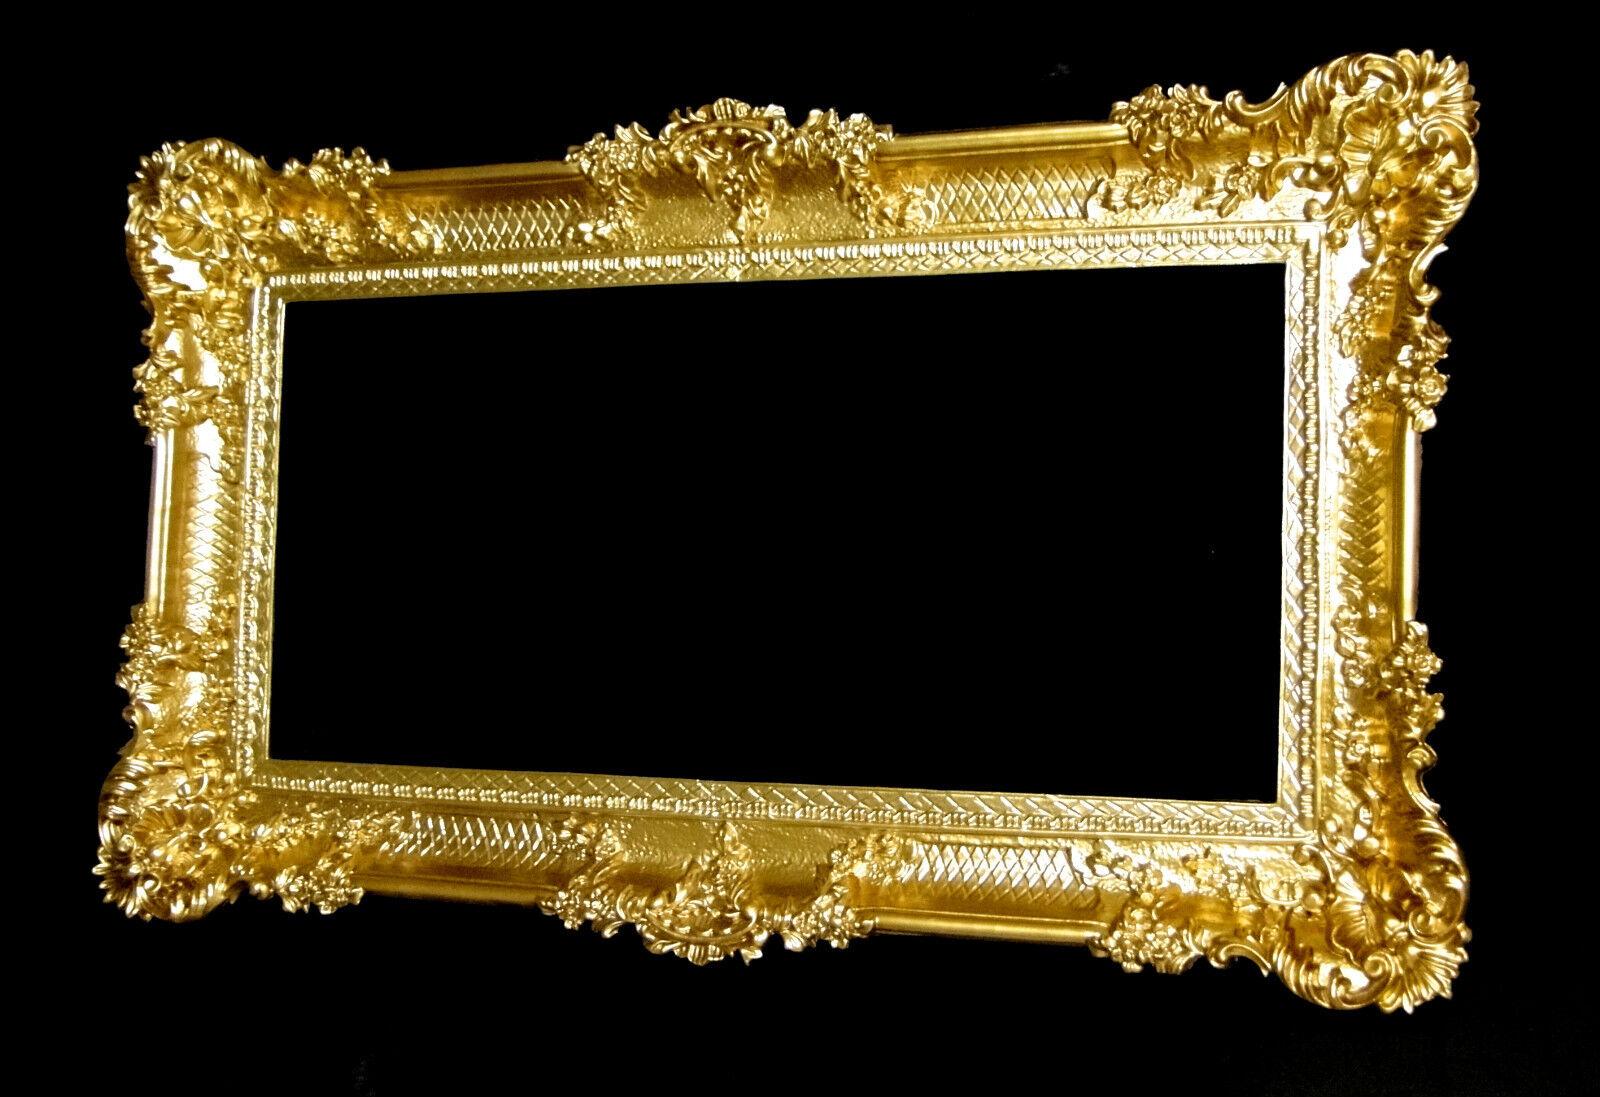 barock spiegel wandspiegel rechteckig antik badspiegel gold antik 96x57 206 1 eur 79 90. Black Bedroom Furniture Sets. Home Design Ideas